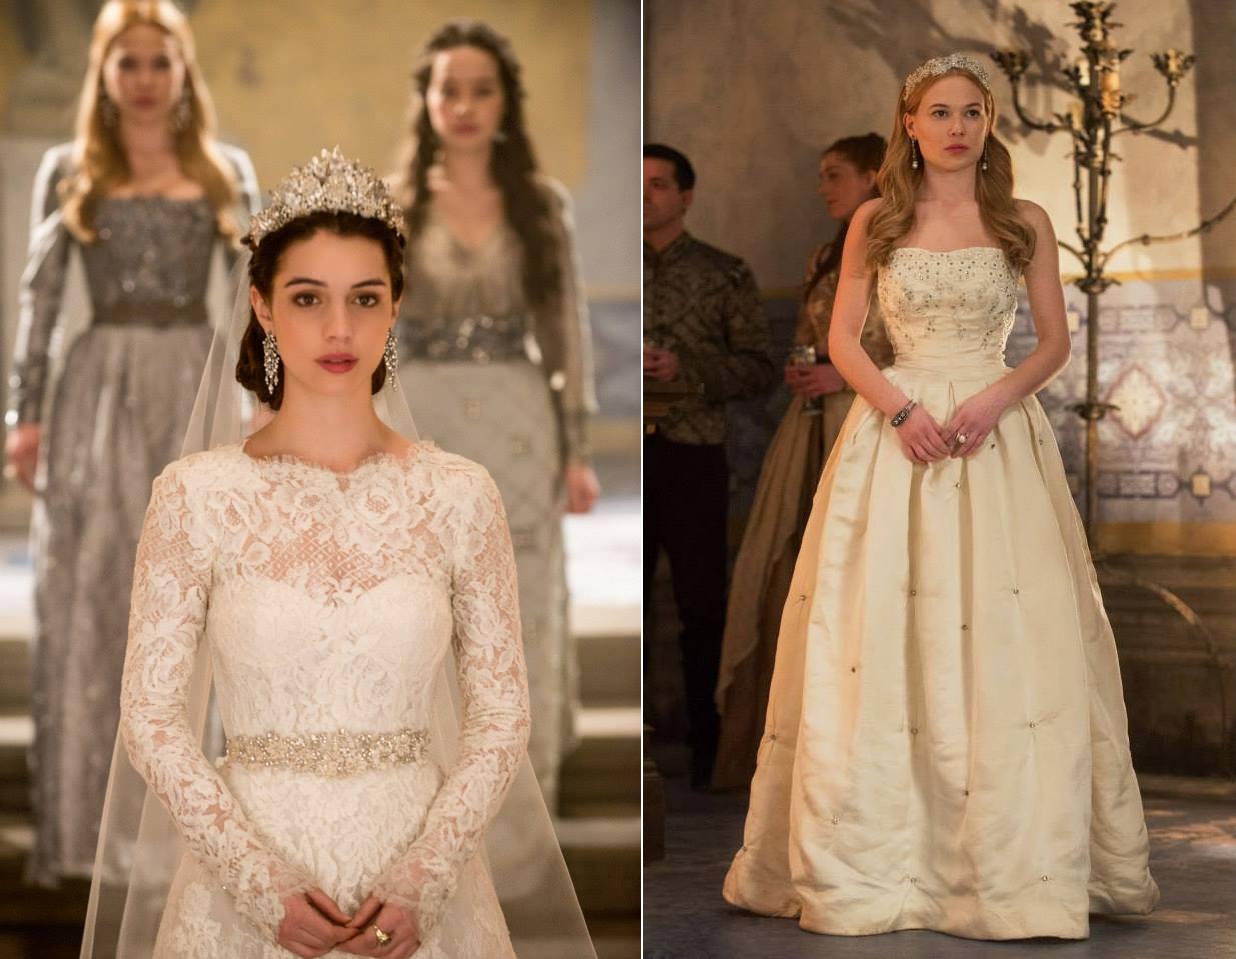 Queen Elizabeth Renaissance Aquela Zona!: Reign